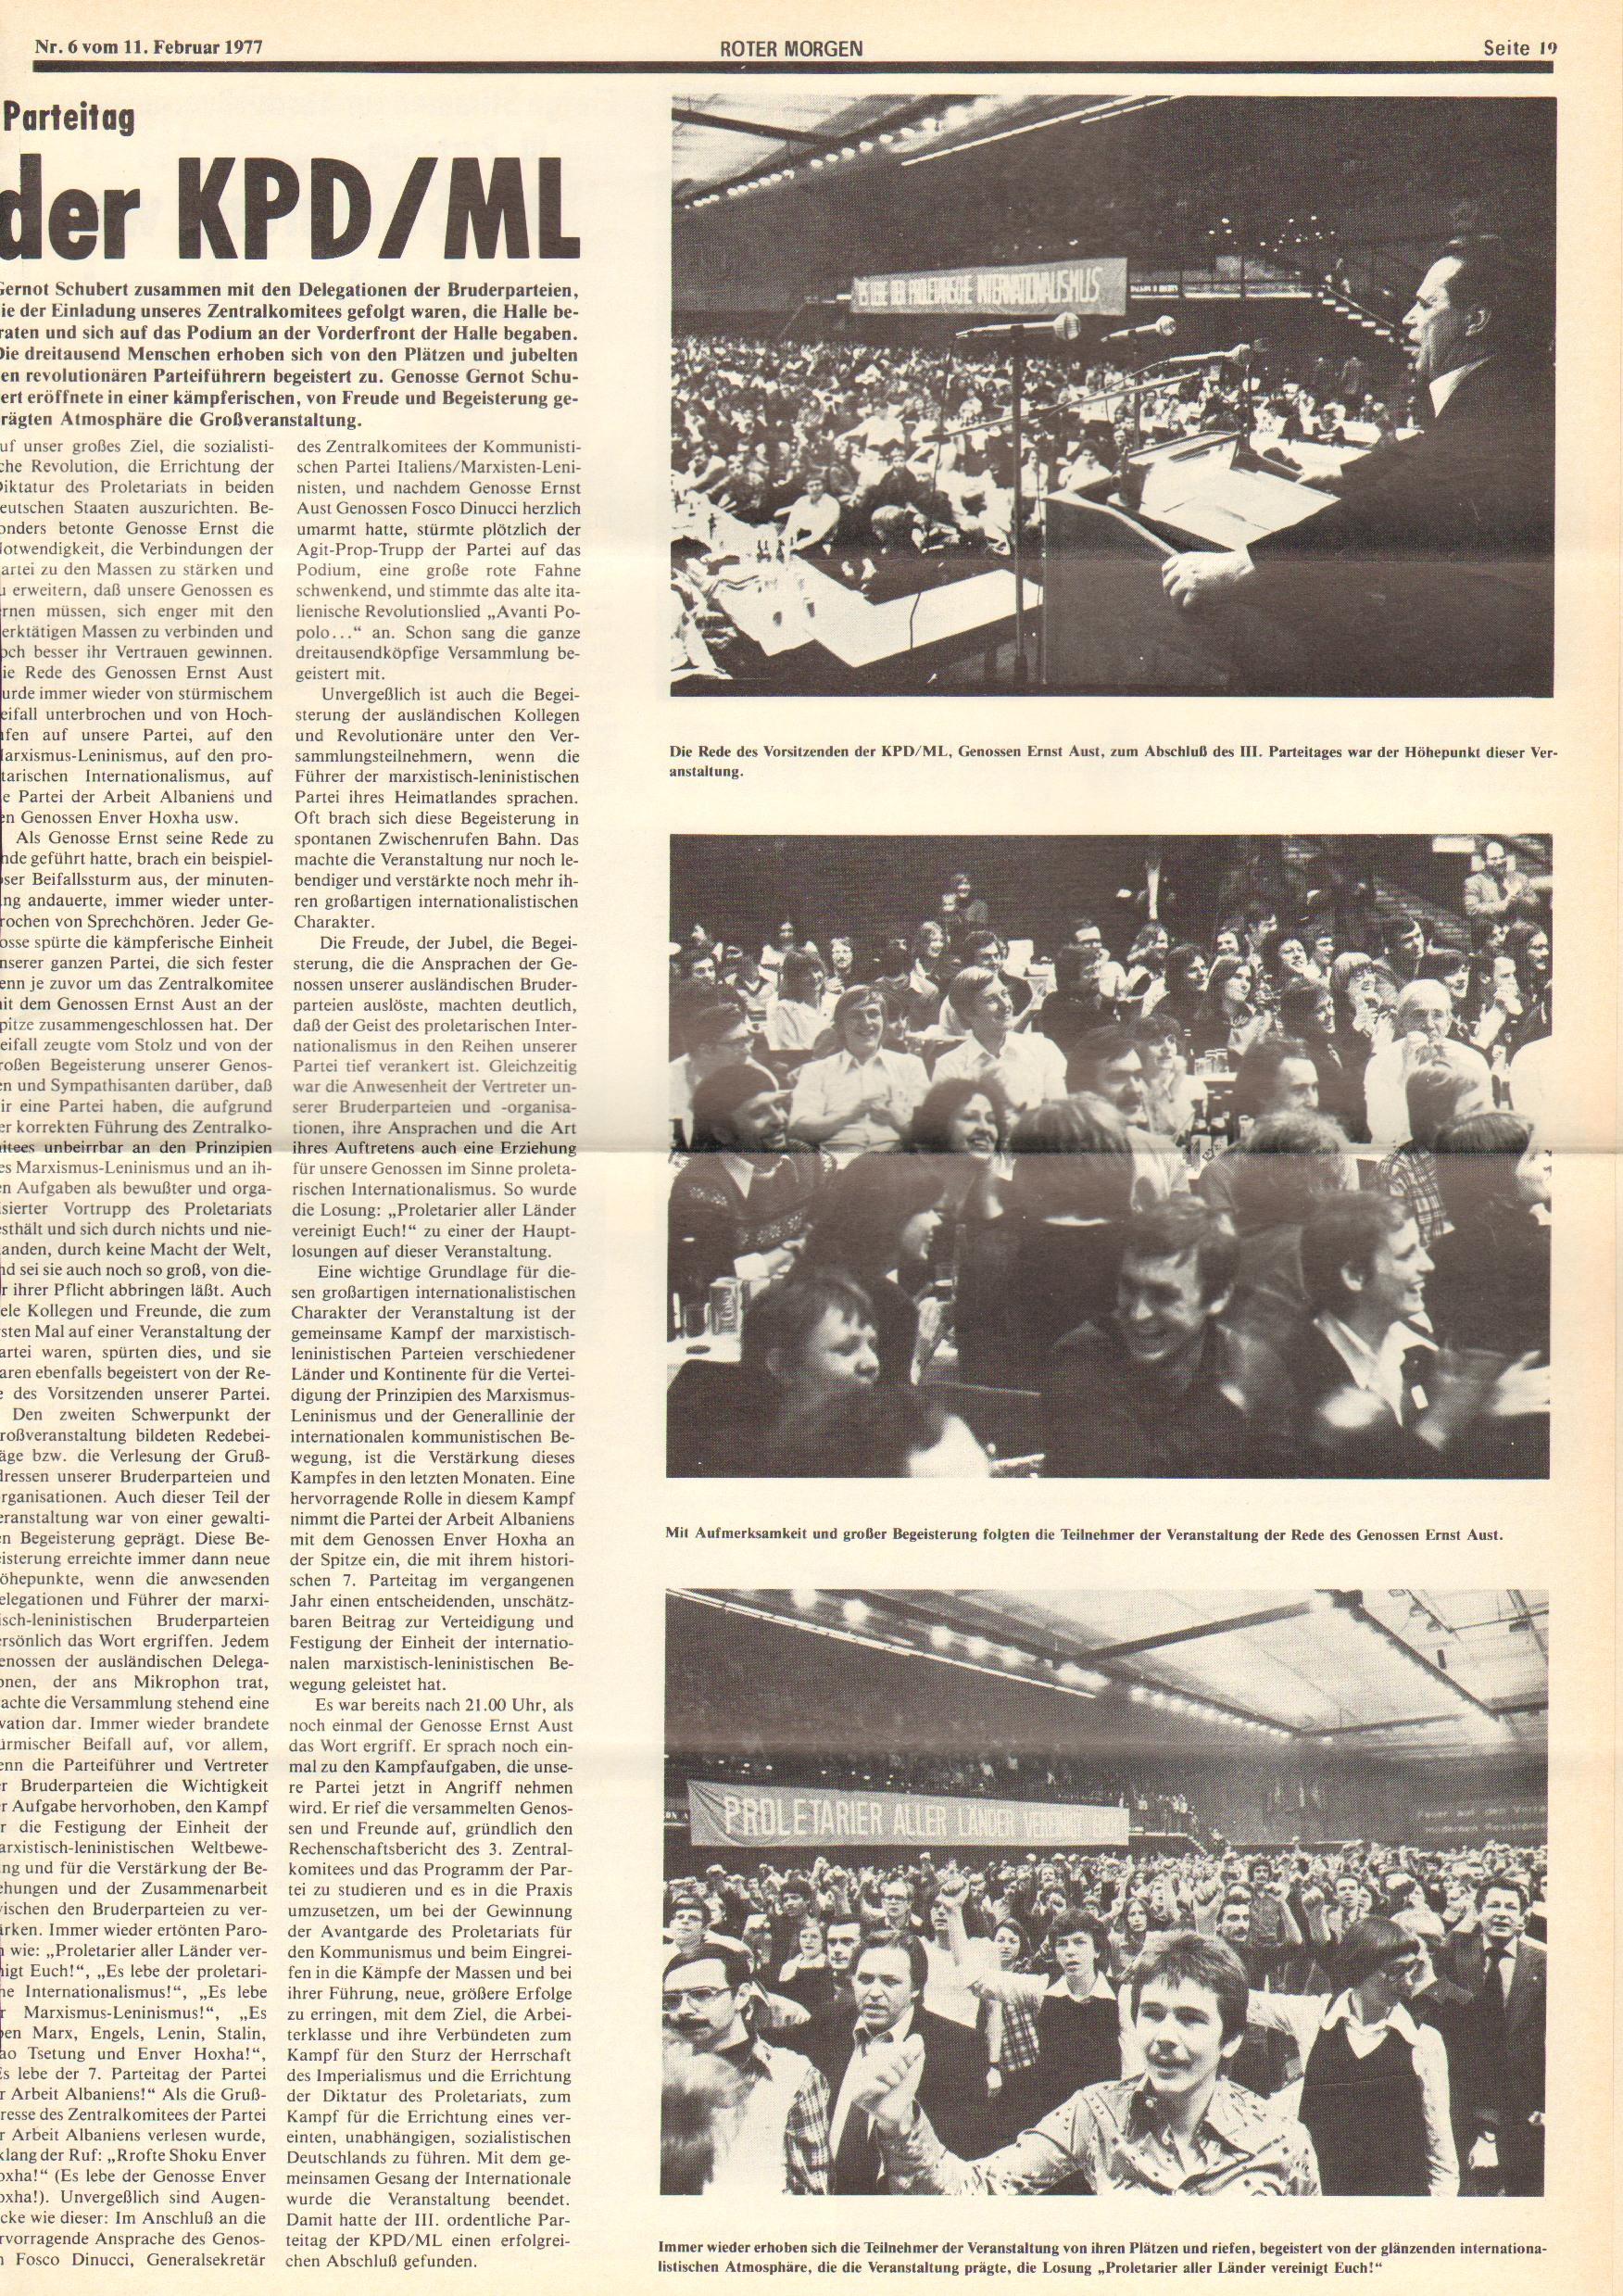 Roter Morgen, 11. Jg., 11. Februar 1977, Nr. 6, Seite 19